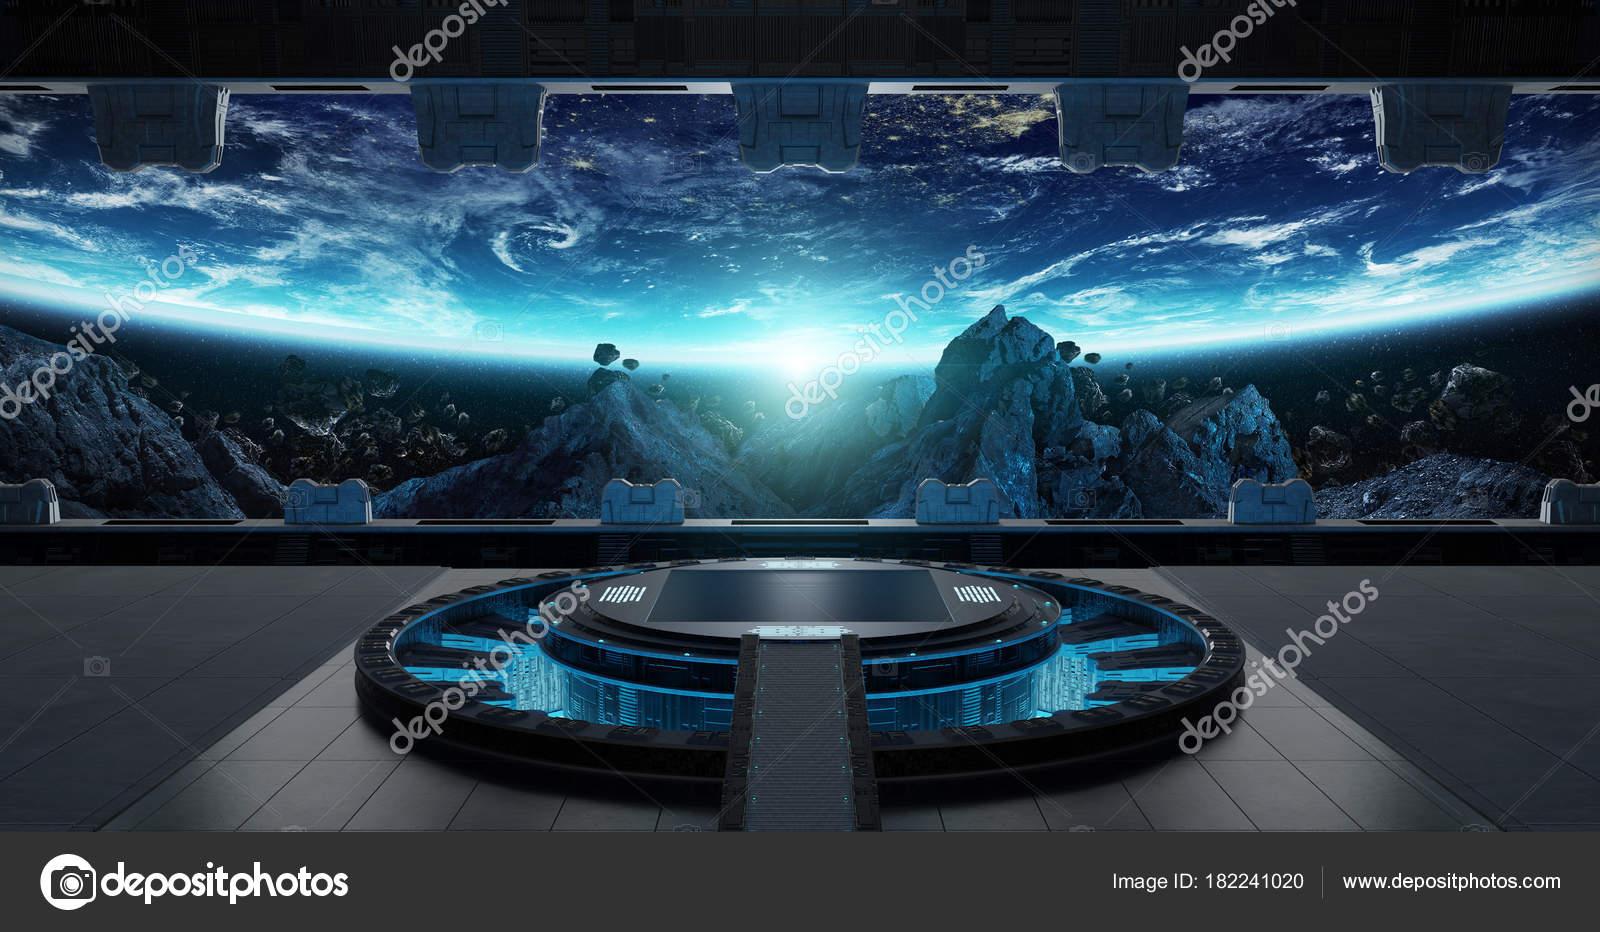 Interior De Ventana De Nave Espacial: Elementos De Representación De Nave Espacial 3d Interior